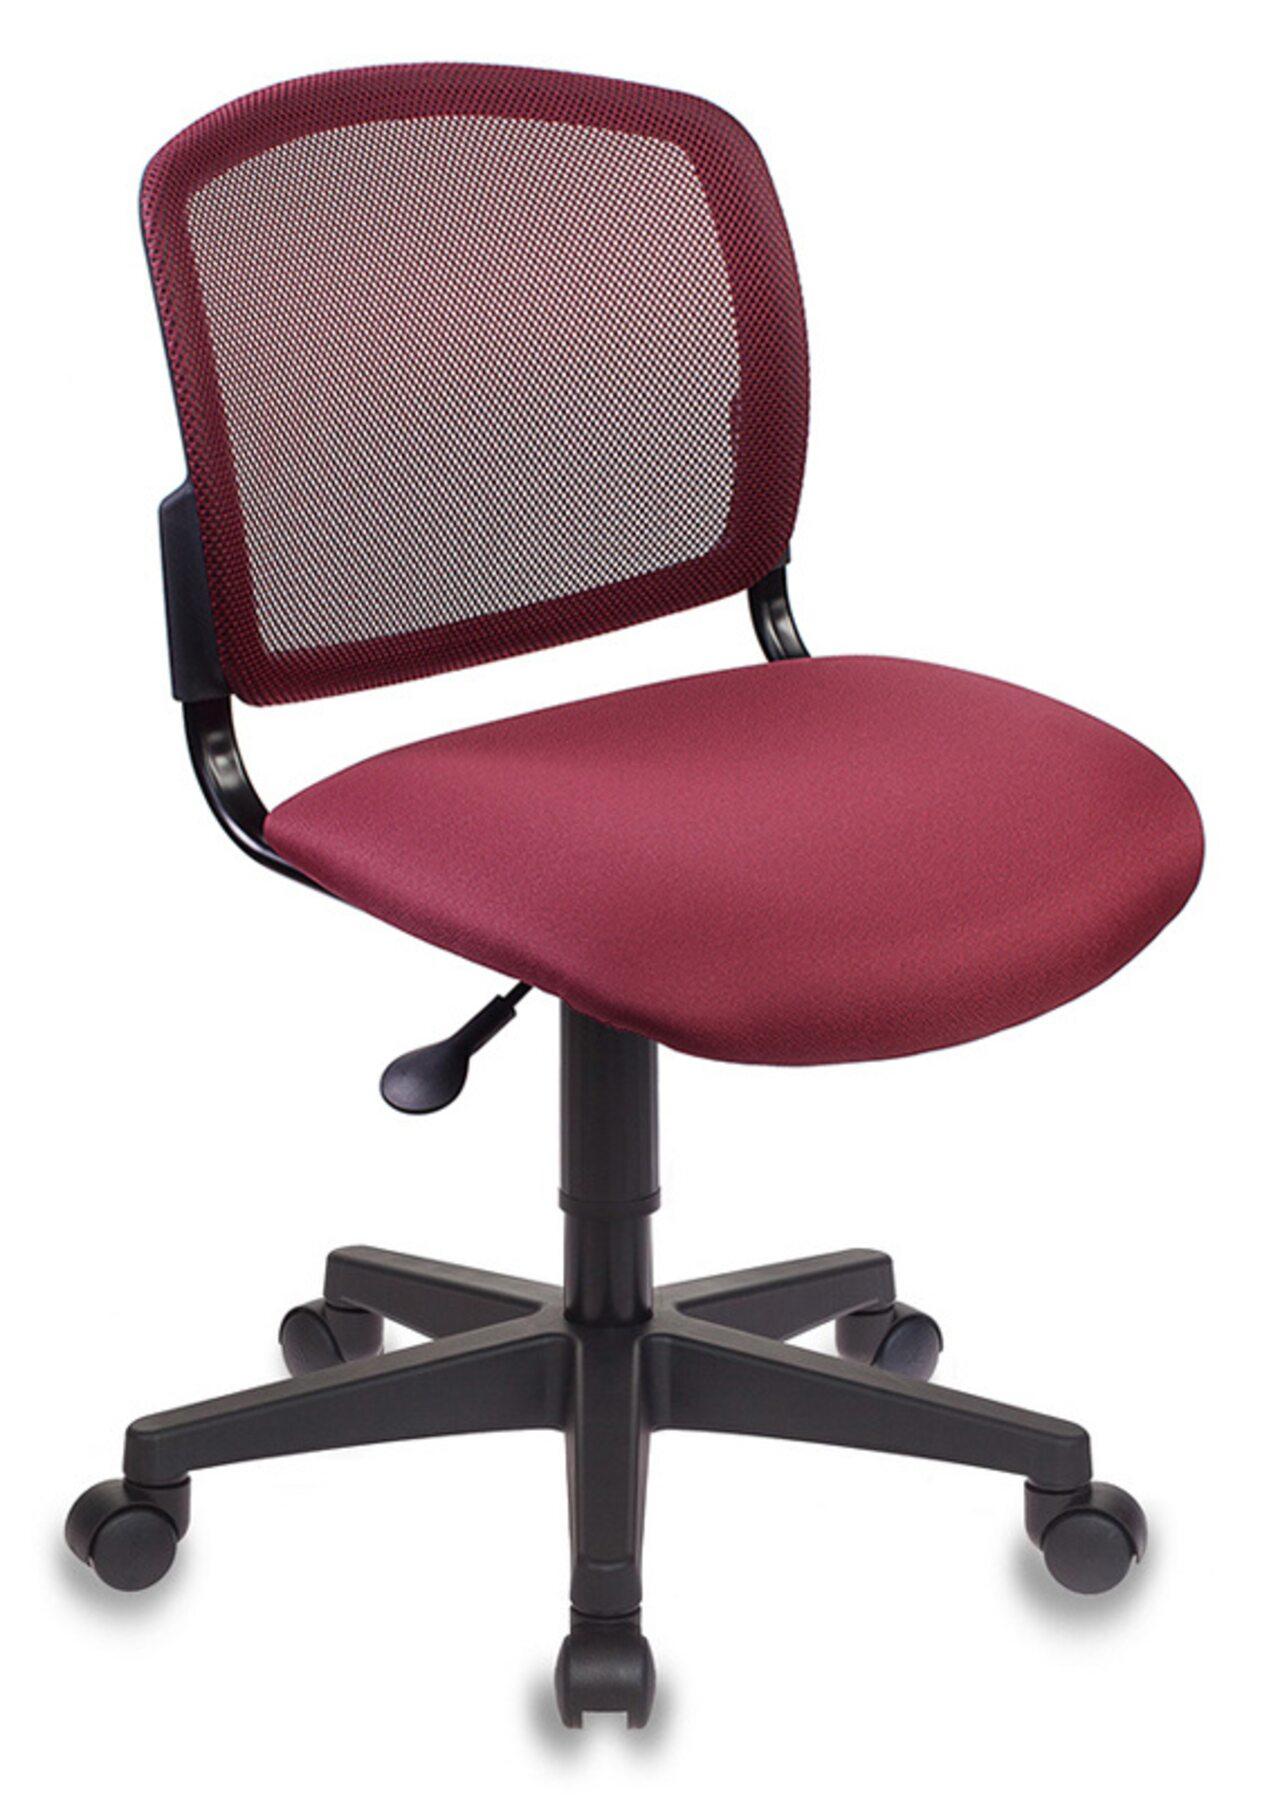 Кресло для персонала CH-296/BL/15-10 - фото 8